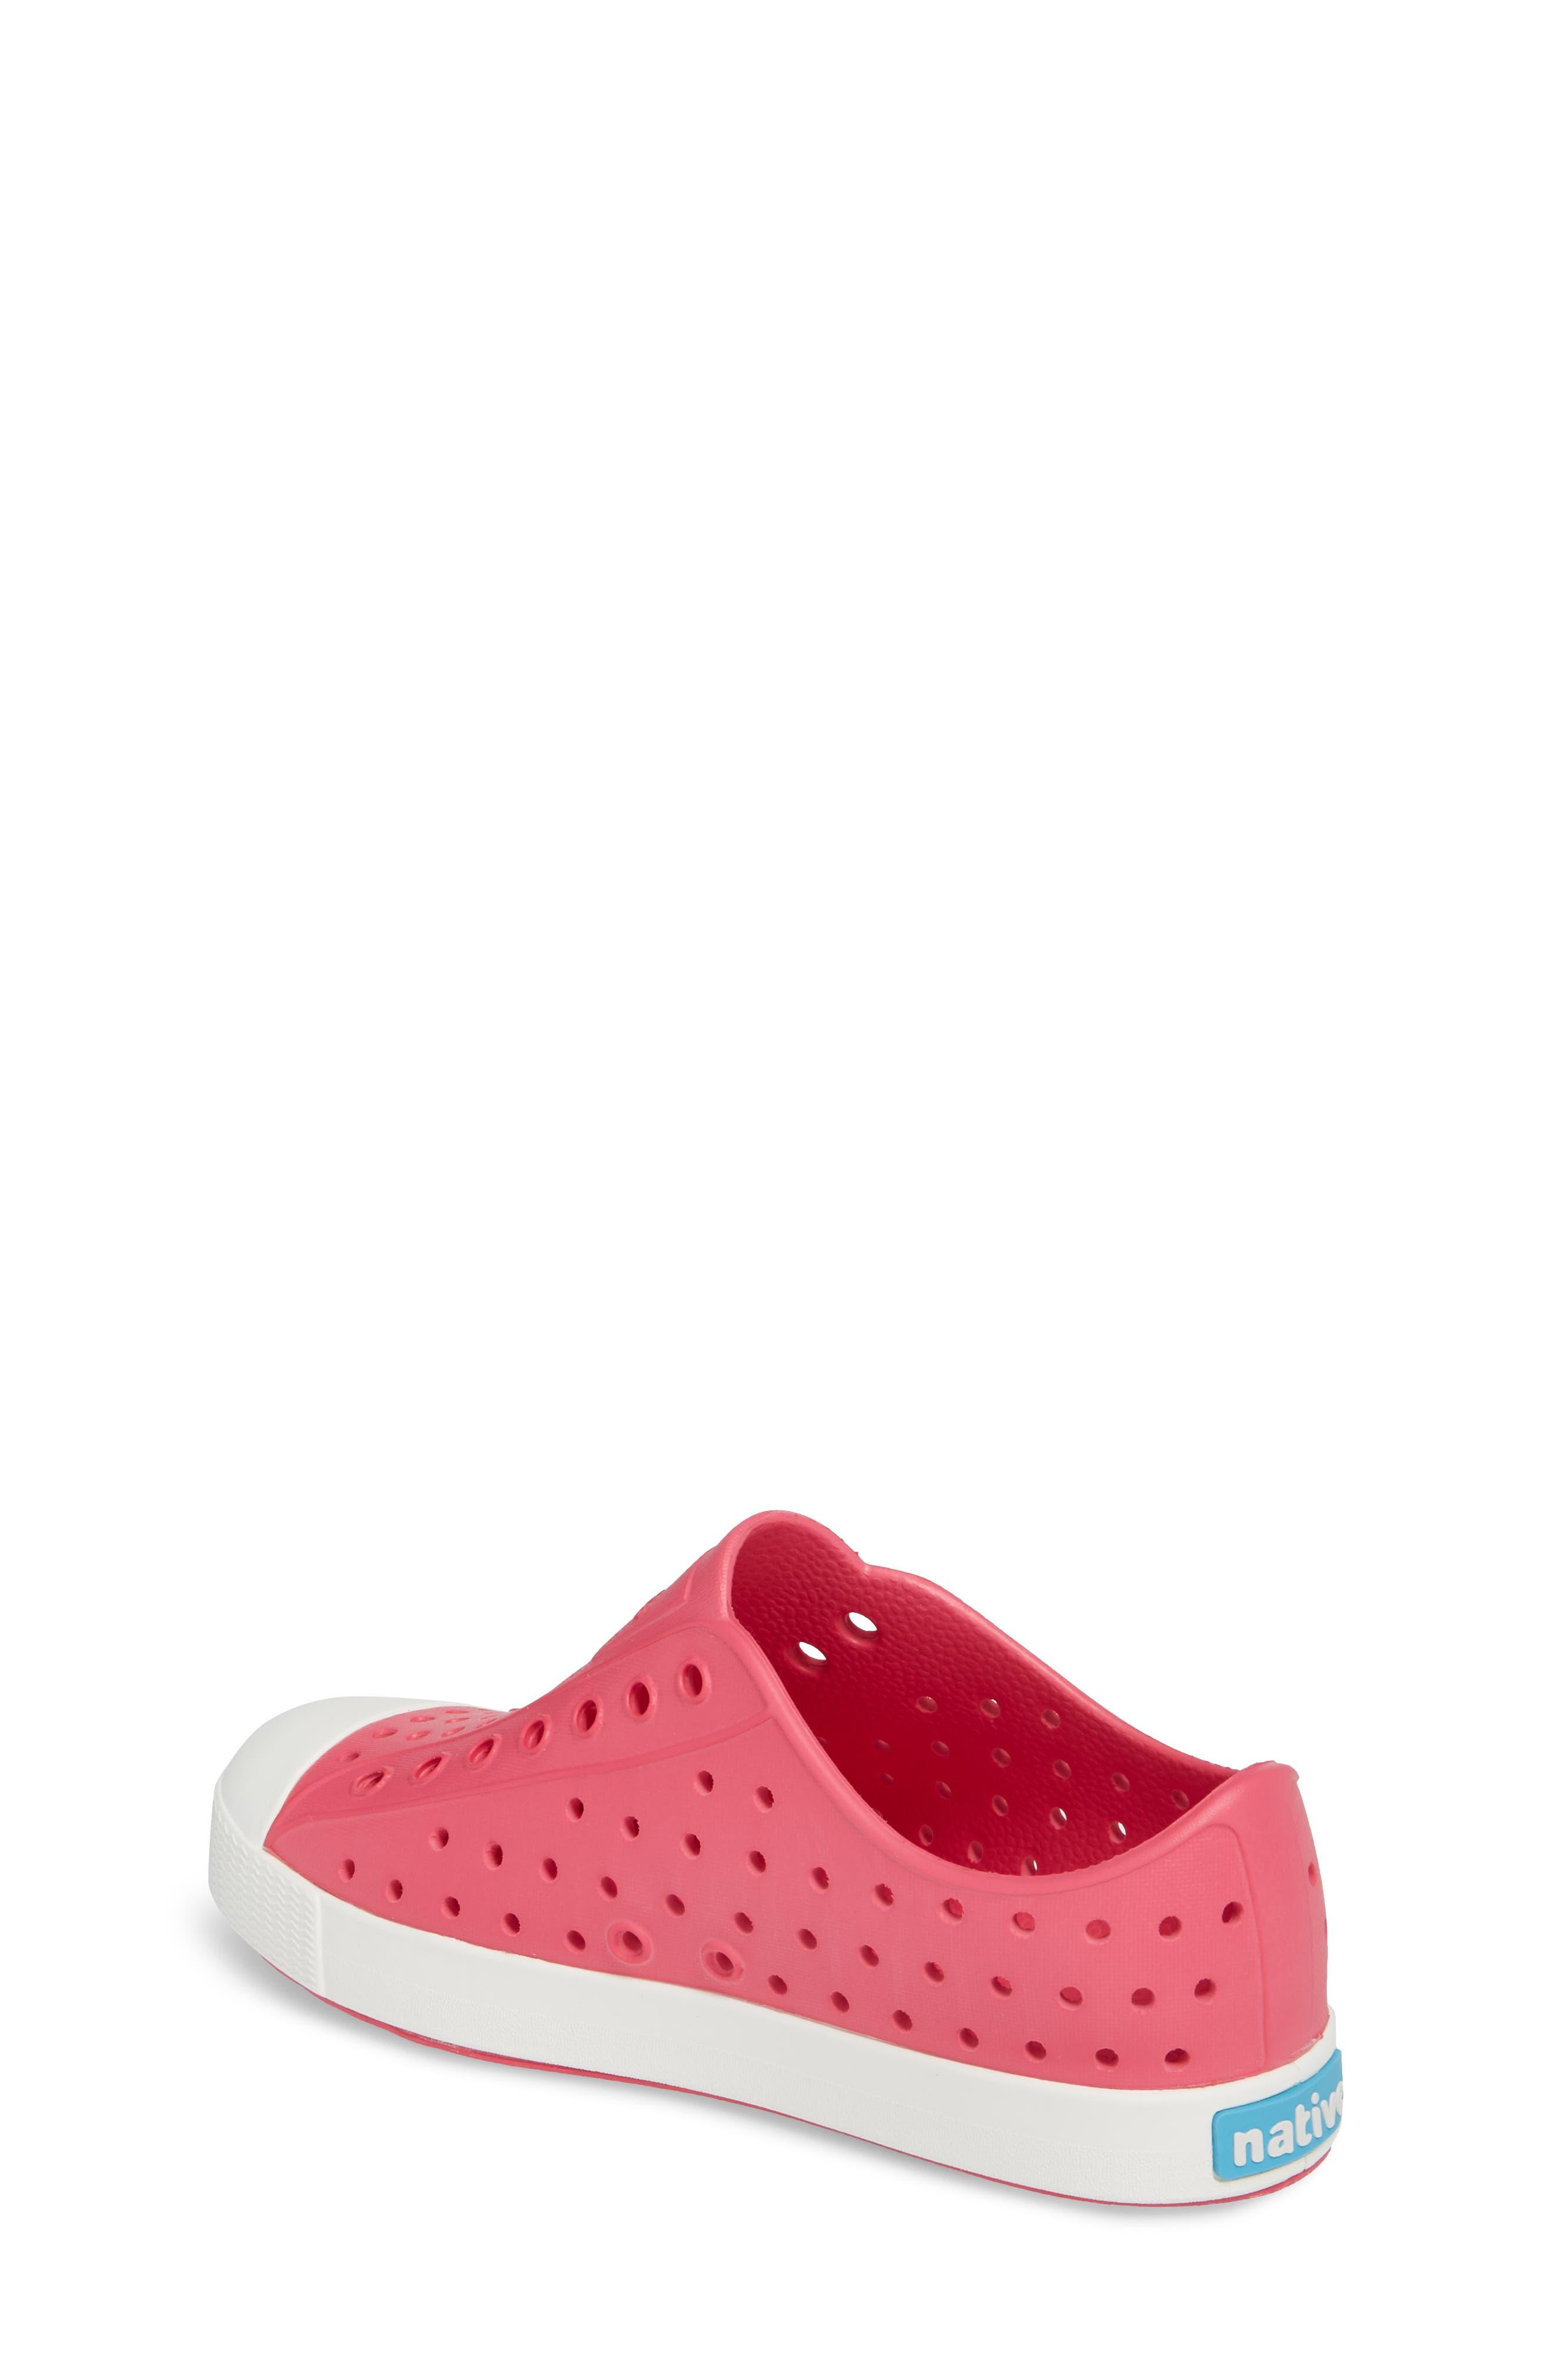 'Jefferson' Water Friendly Slip-On Sneaker,                             Alternate thumbnail 79, color,